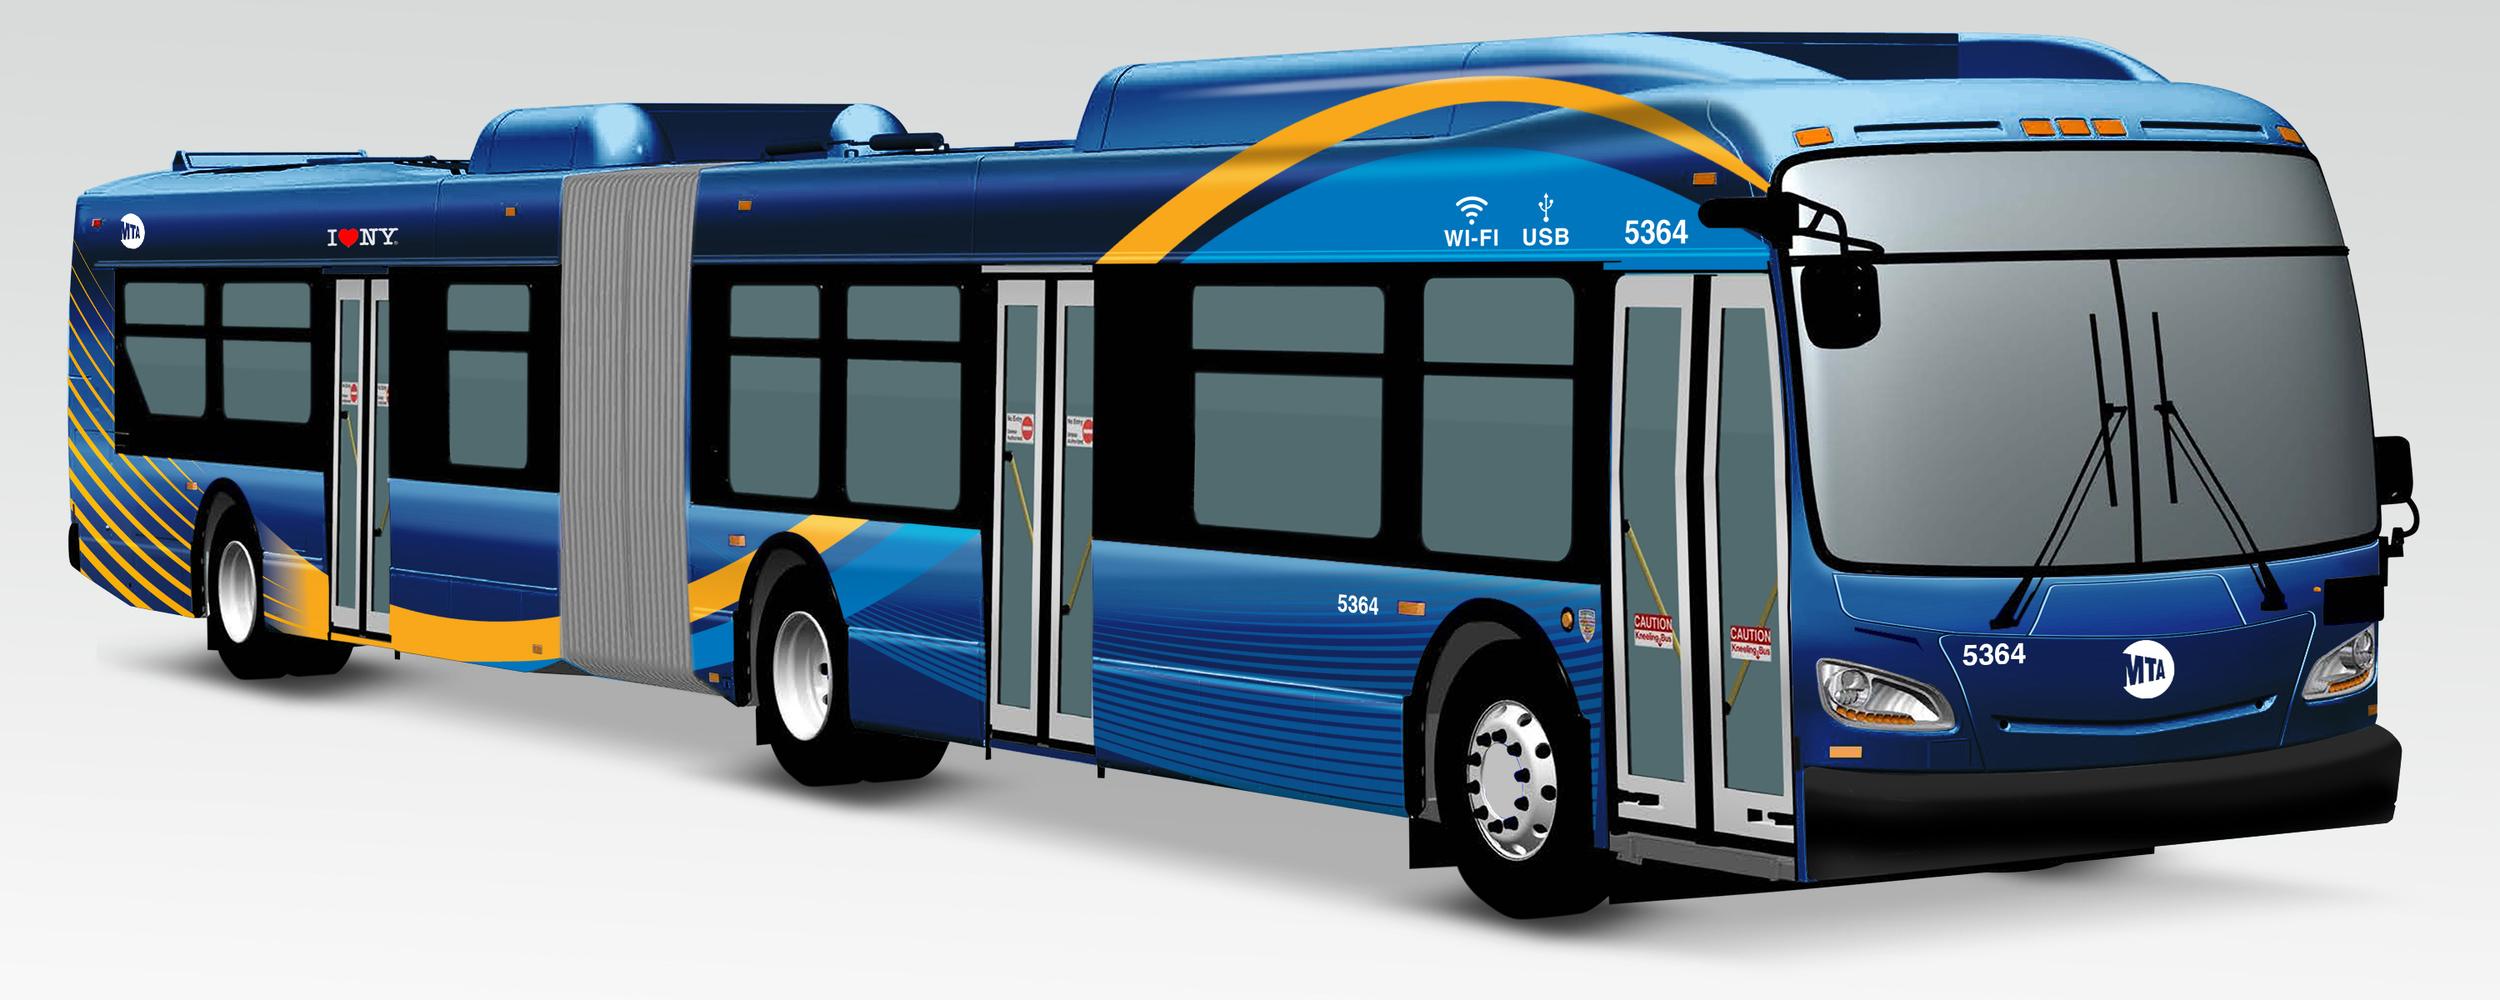 MTA_WIFIMobile_Bus_Transportation_Event_hero2.jpg